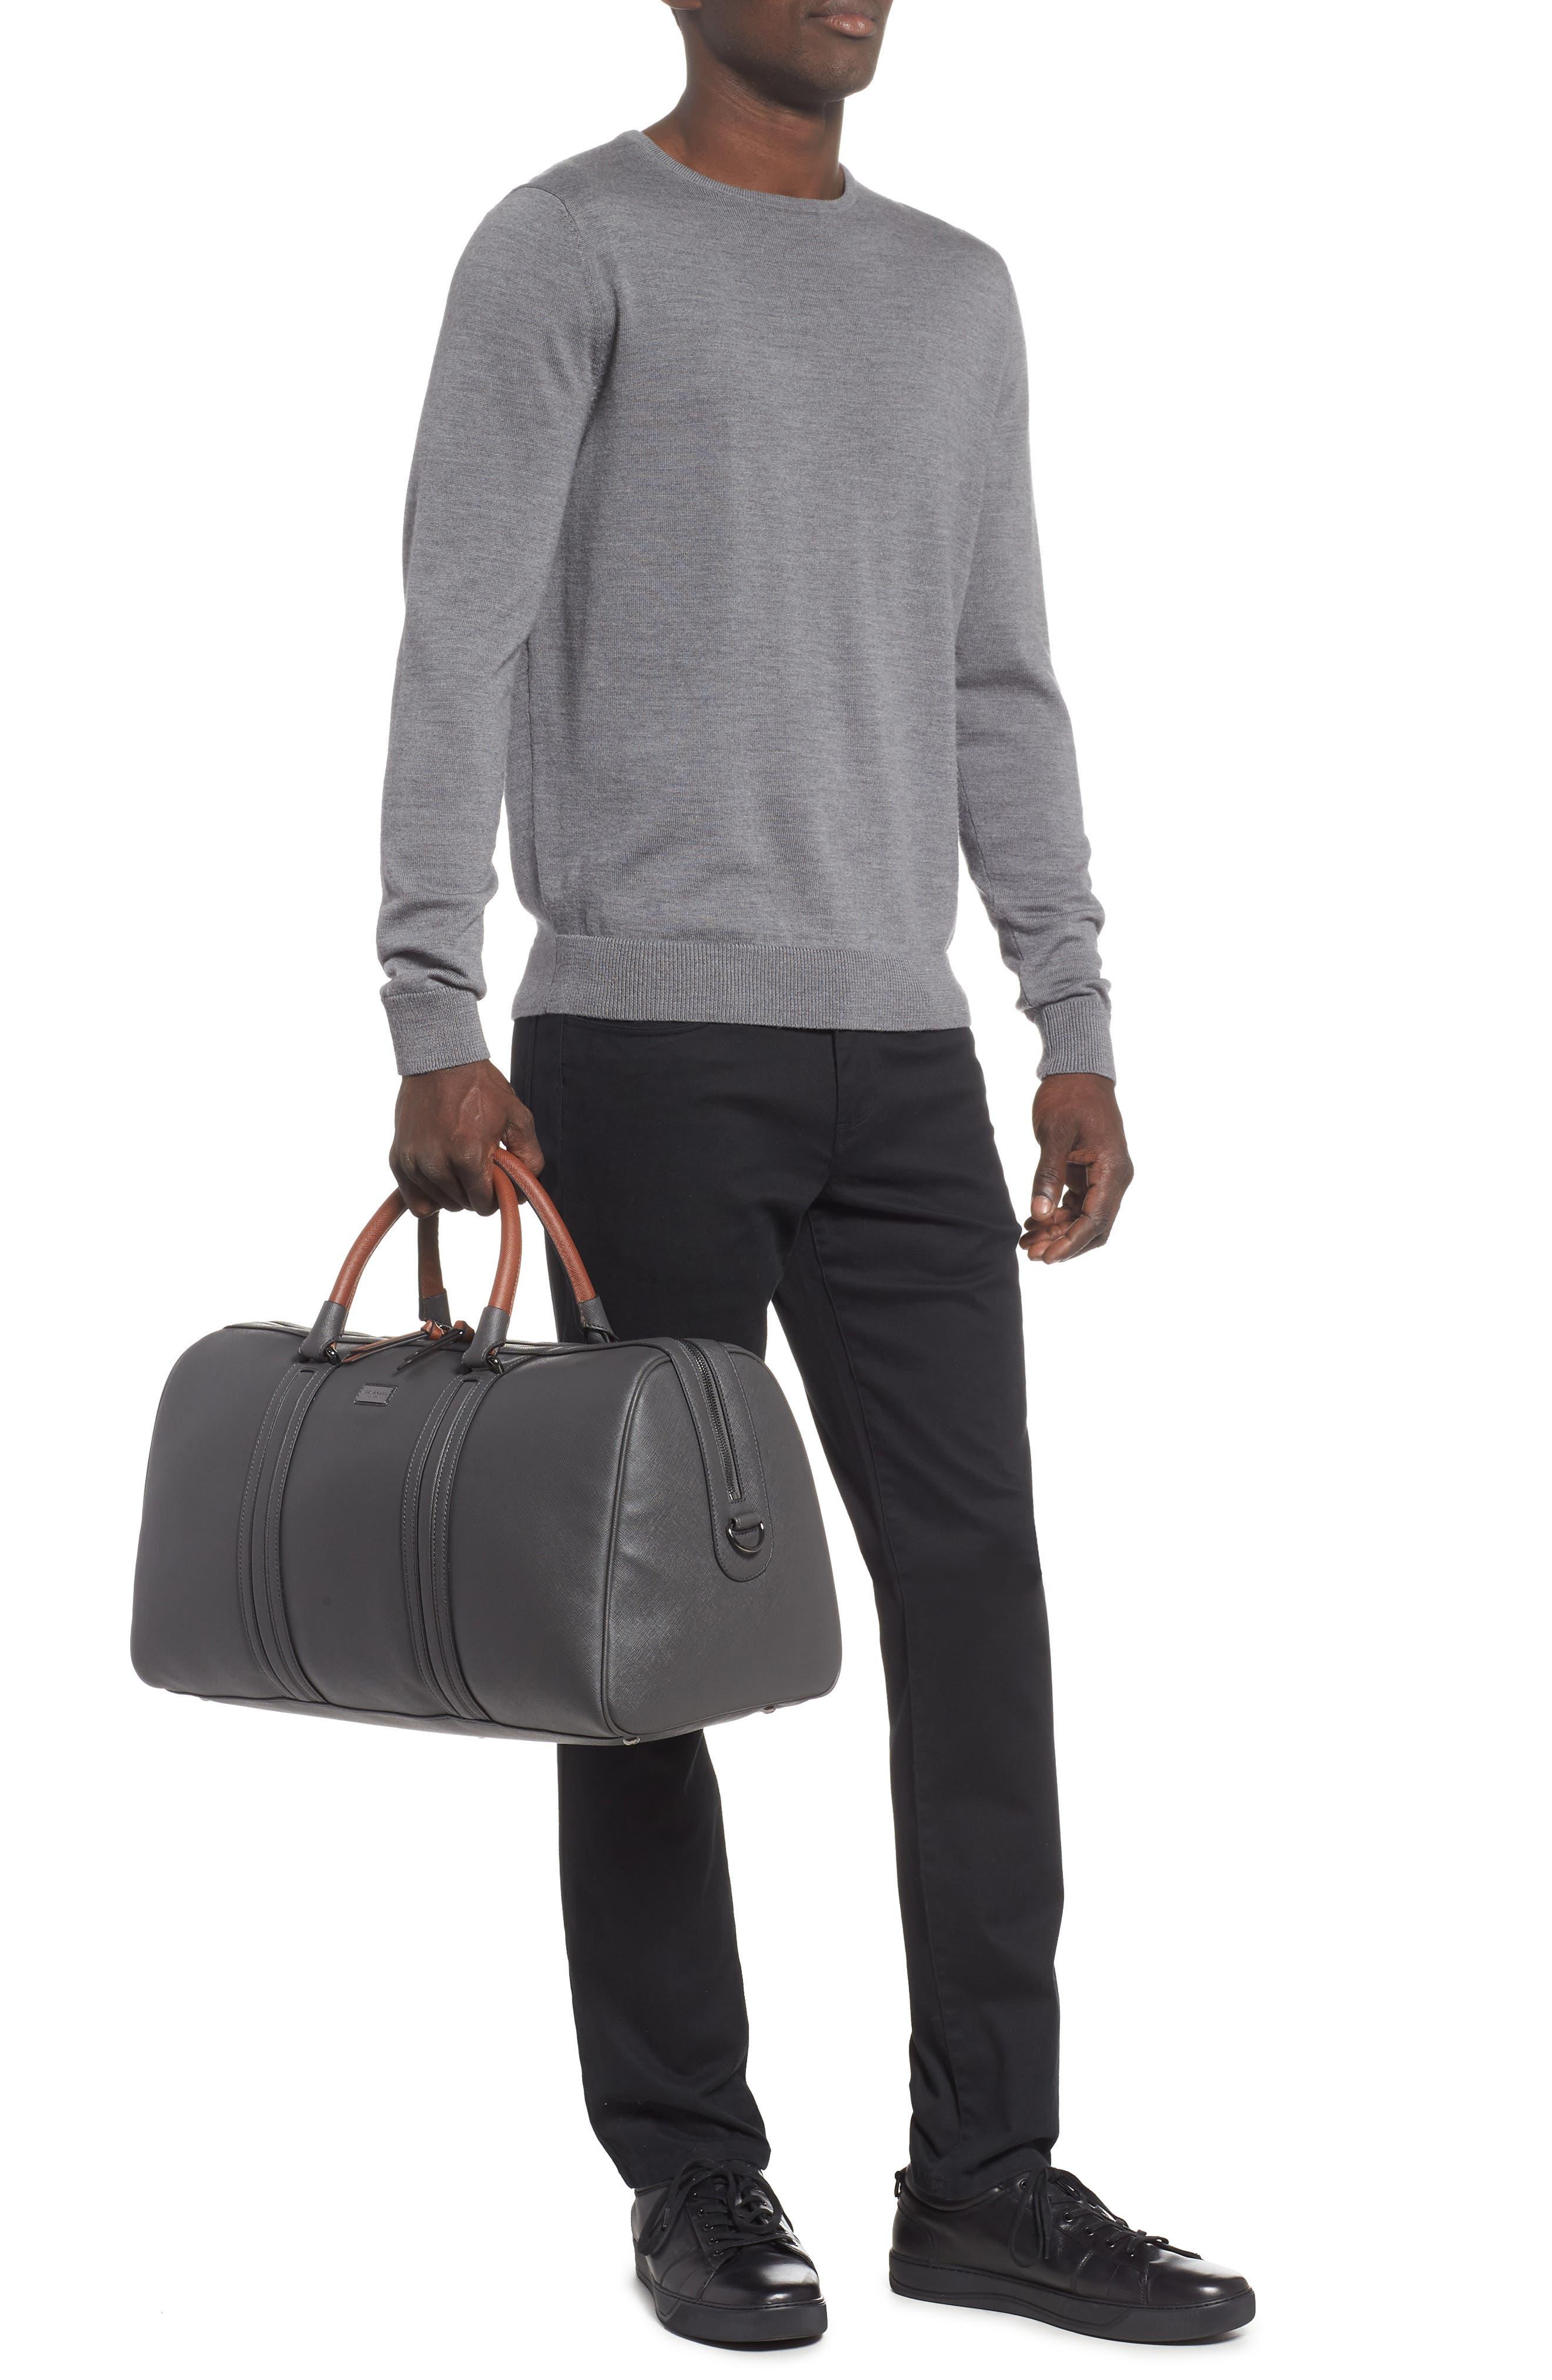 Grankan Faux Leather Duffel Bag,                             Alternate thumbnail 2, color,                             CHARCOAL